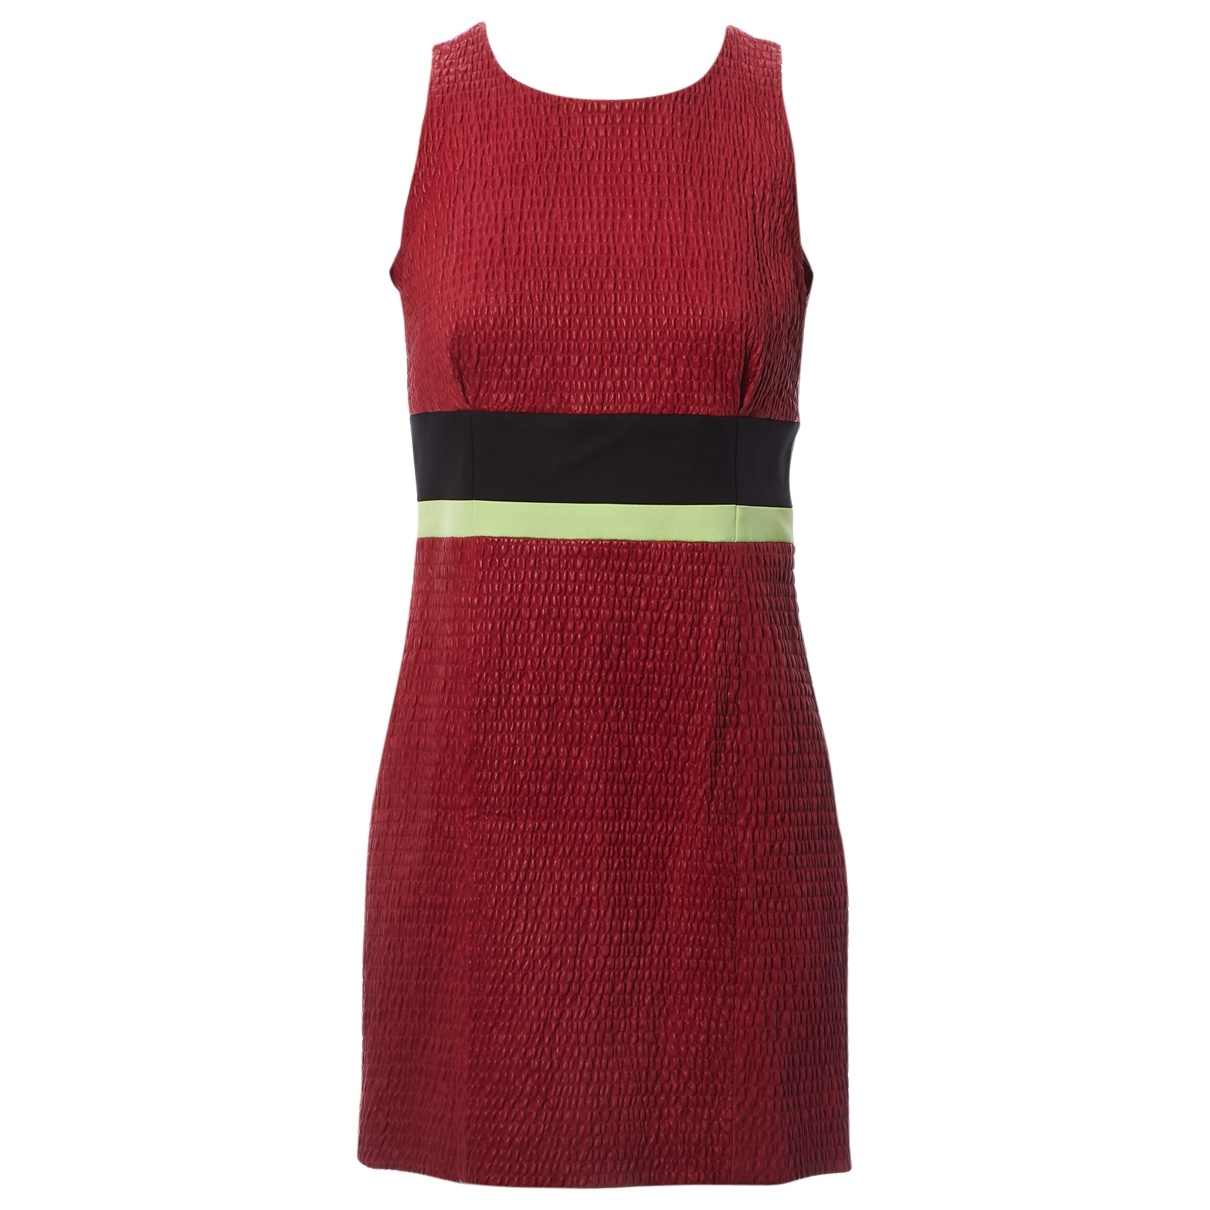 Louis Vuitton \N Burgundy Leather dress for Women 38 FR